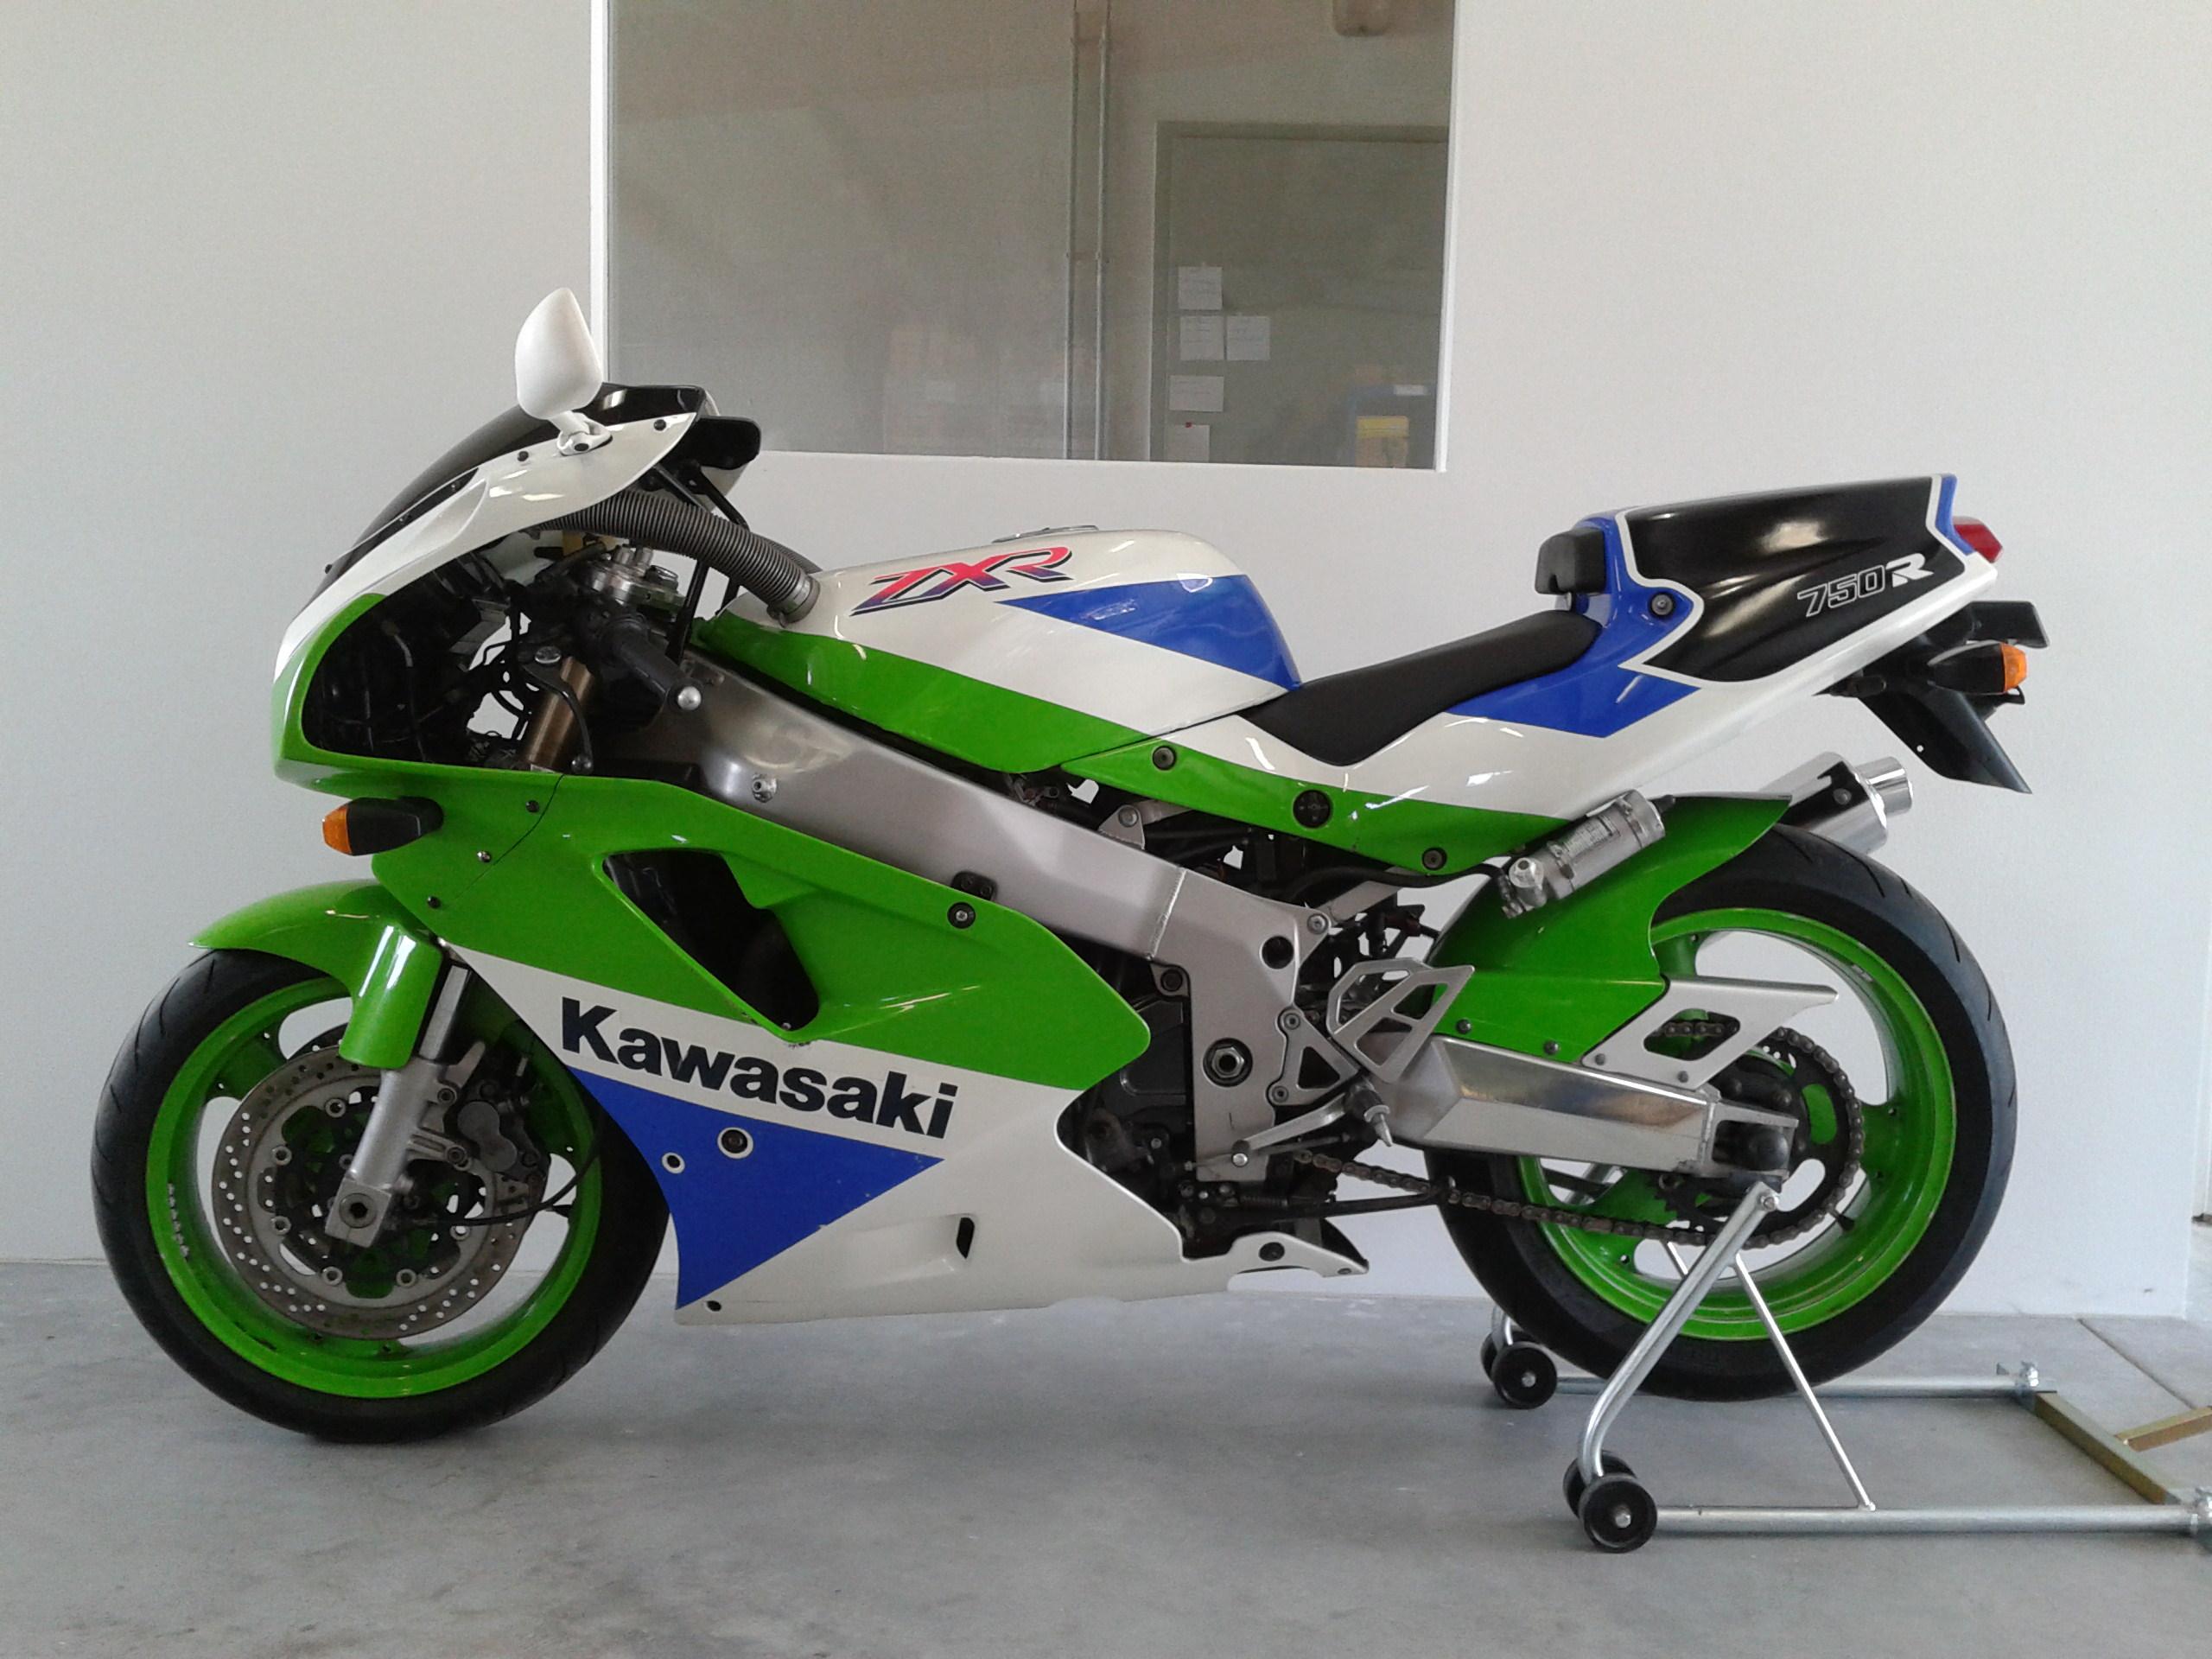 Kawasaki Zxr Fairing Decals